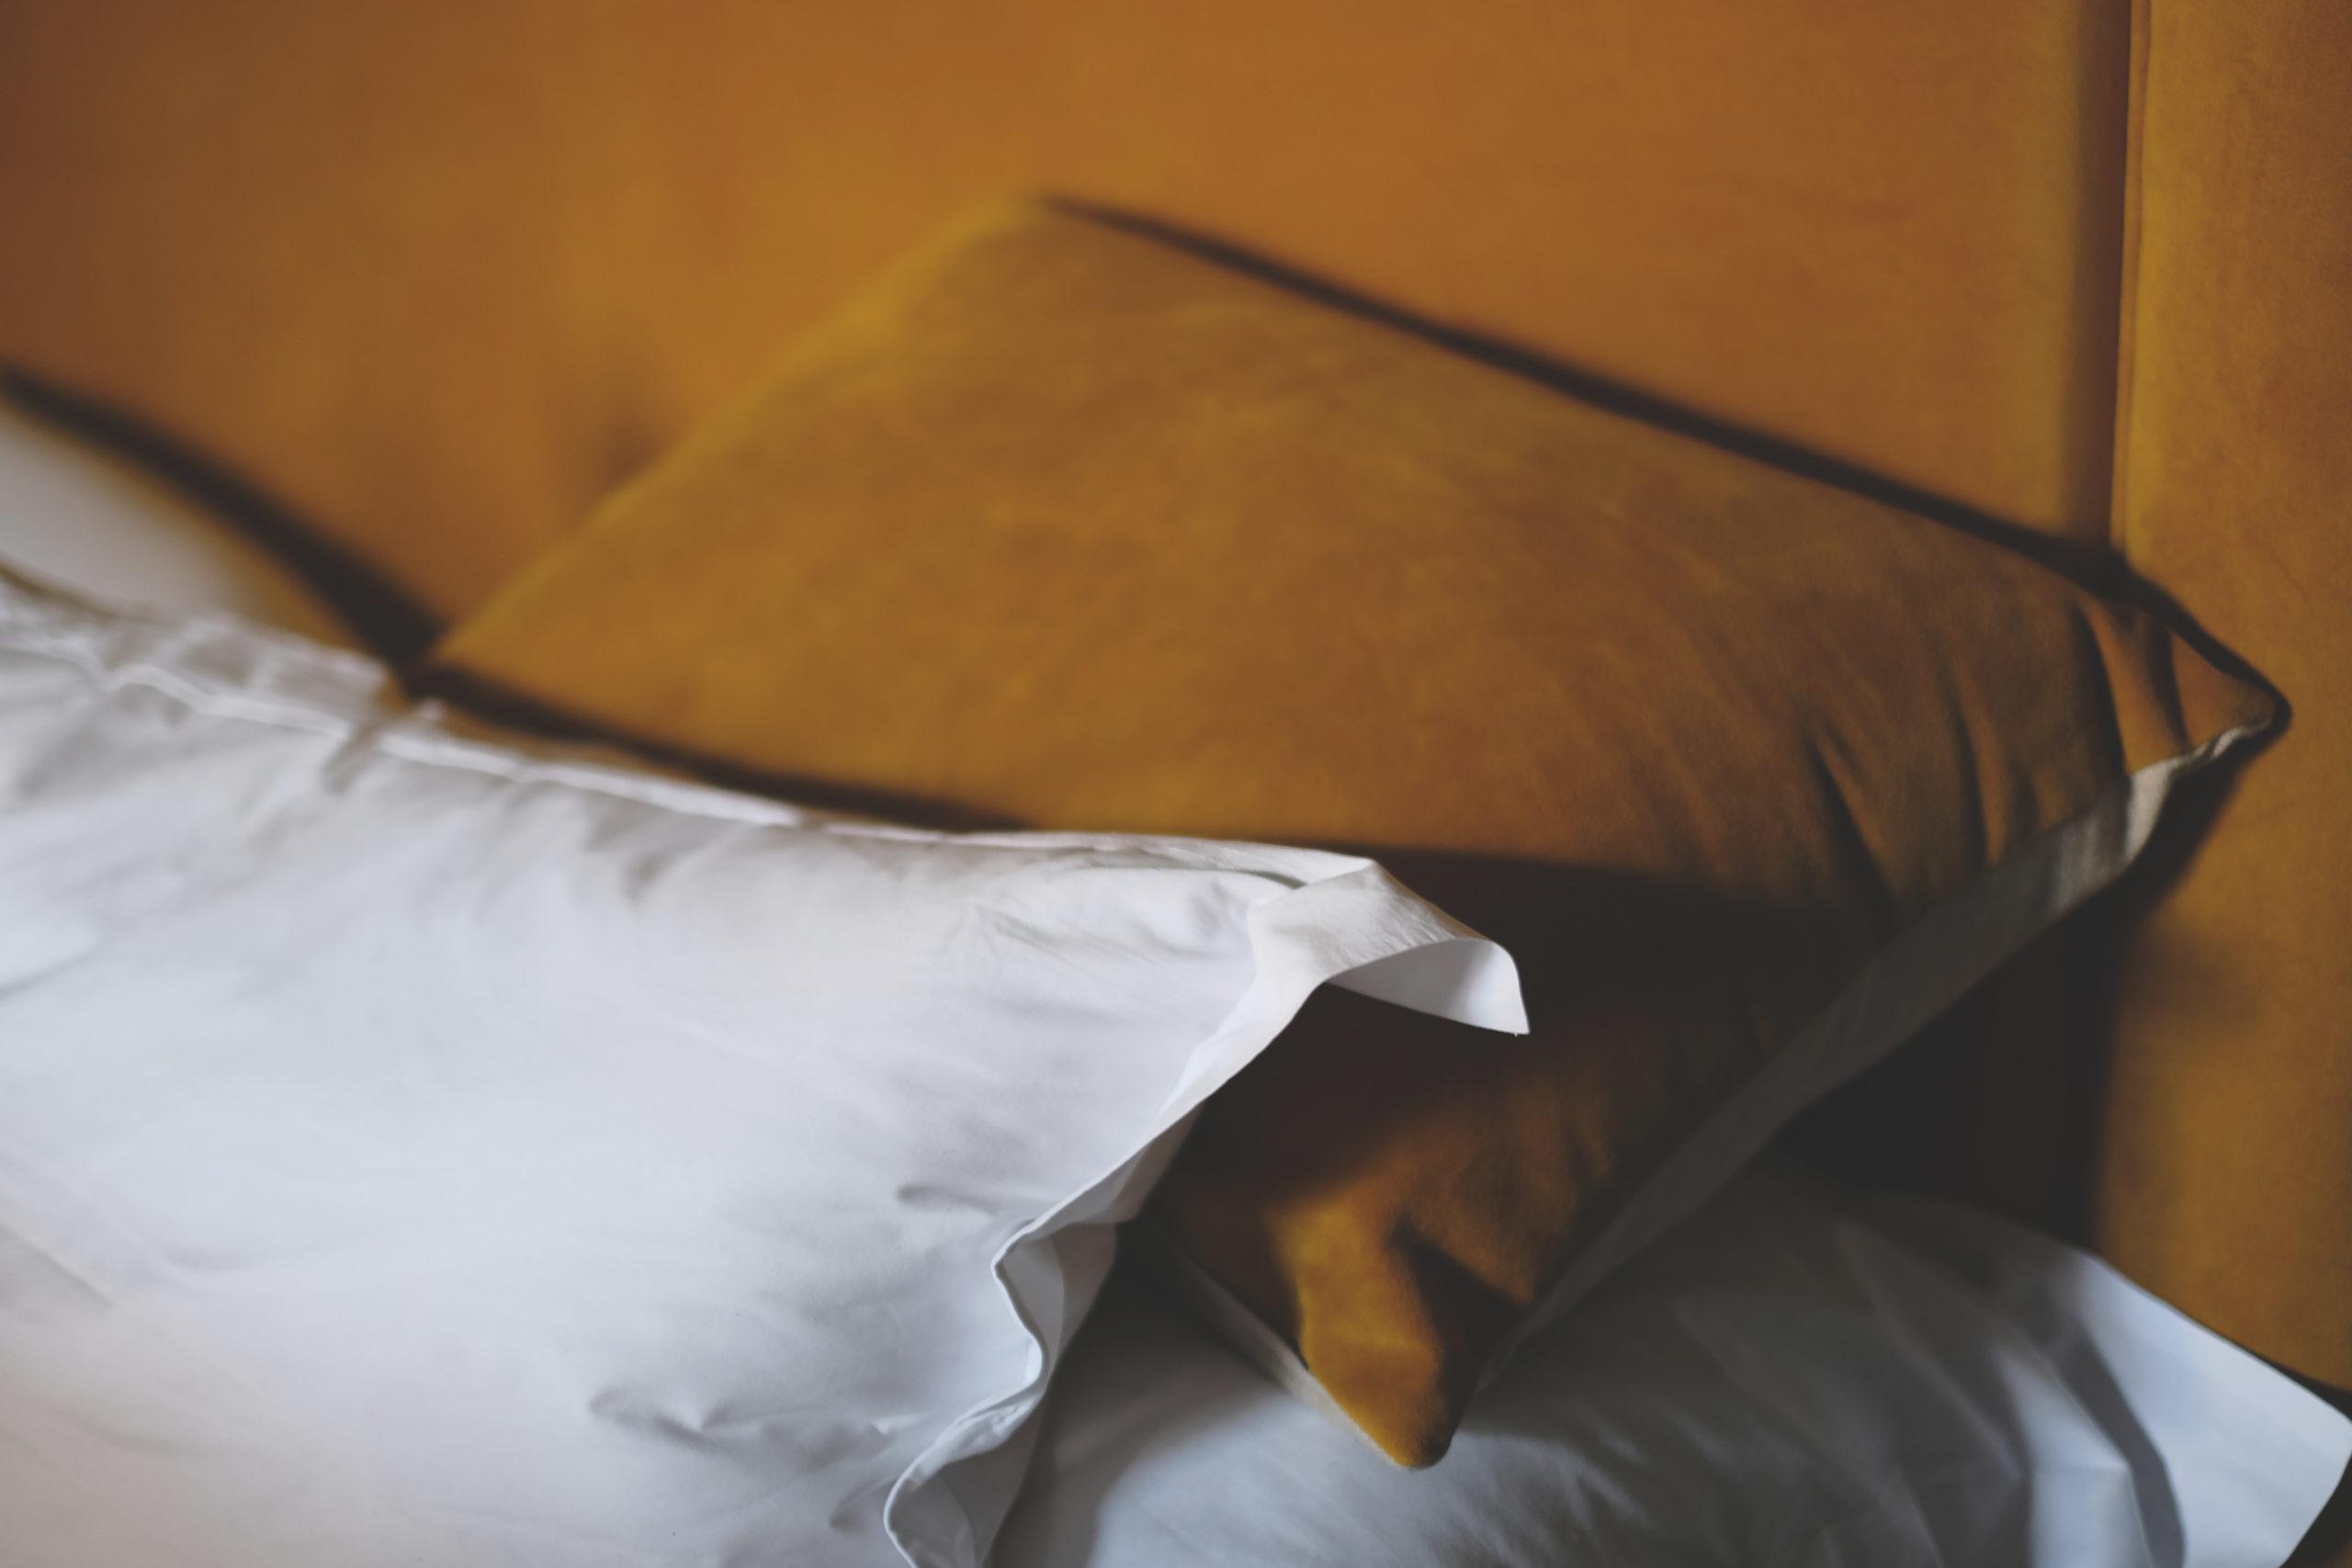 White pillow on top of a mustard brown velvet pillow.